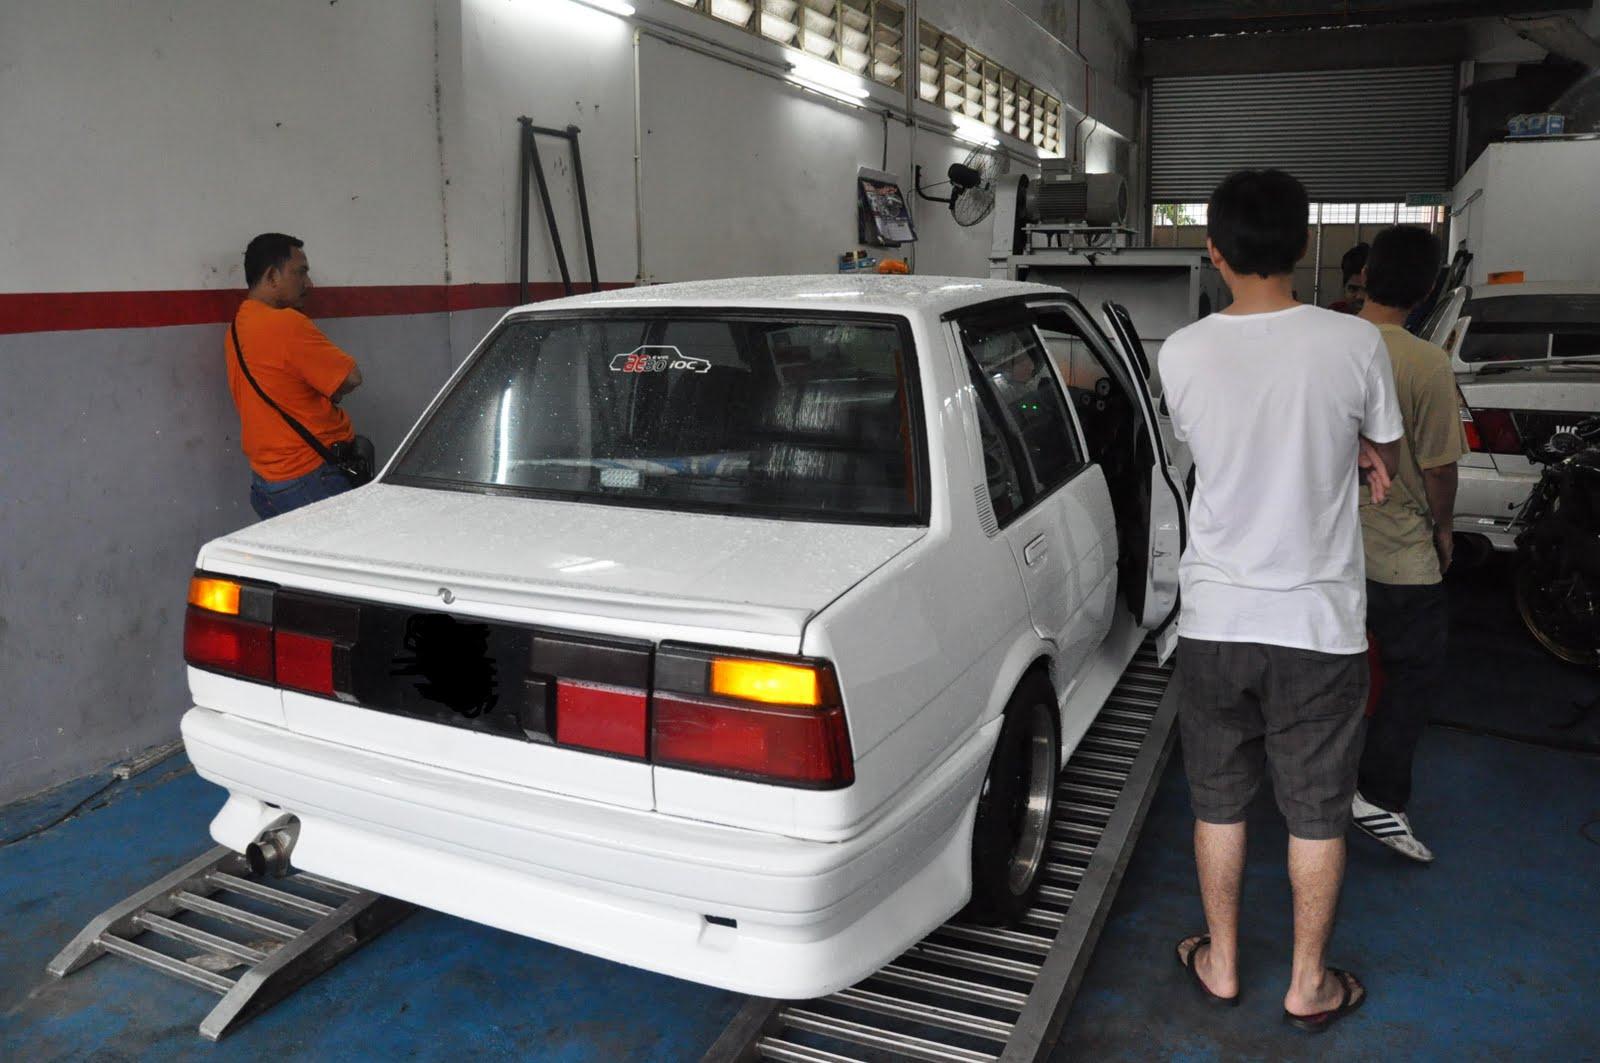 94 Toyota Pickup 22re Wiring Diagram As Well 1994 Toyota Pickup Wiring